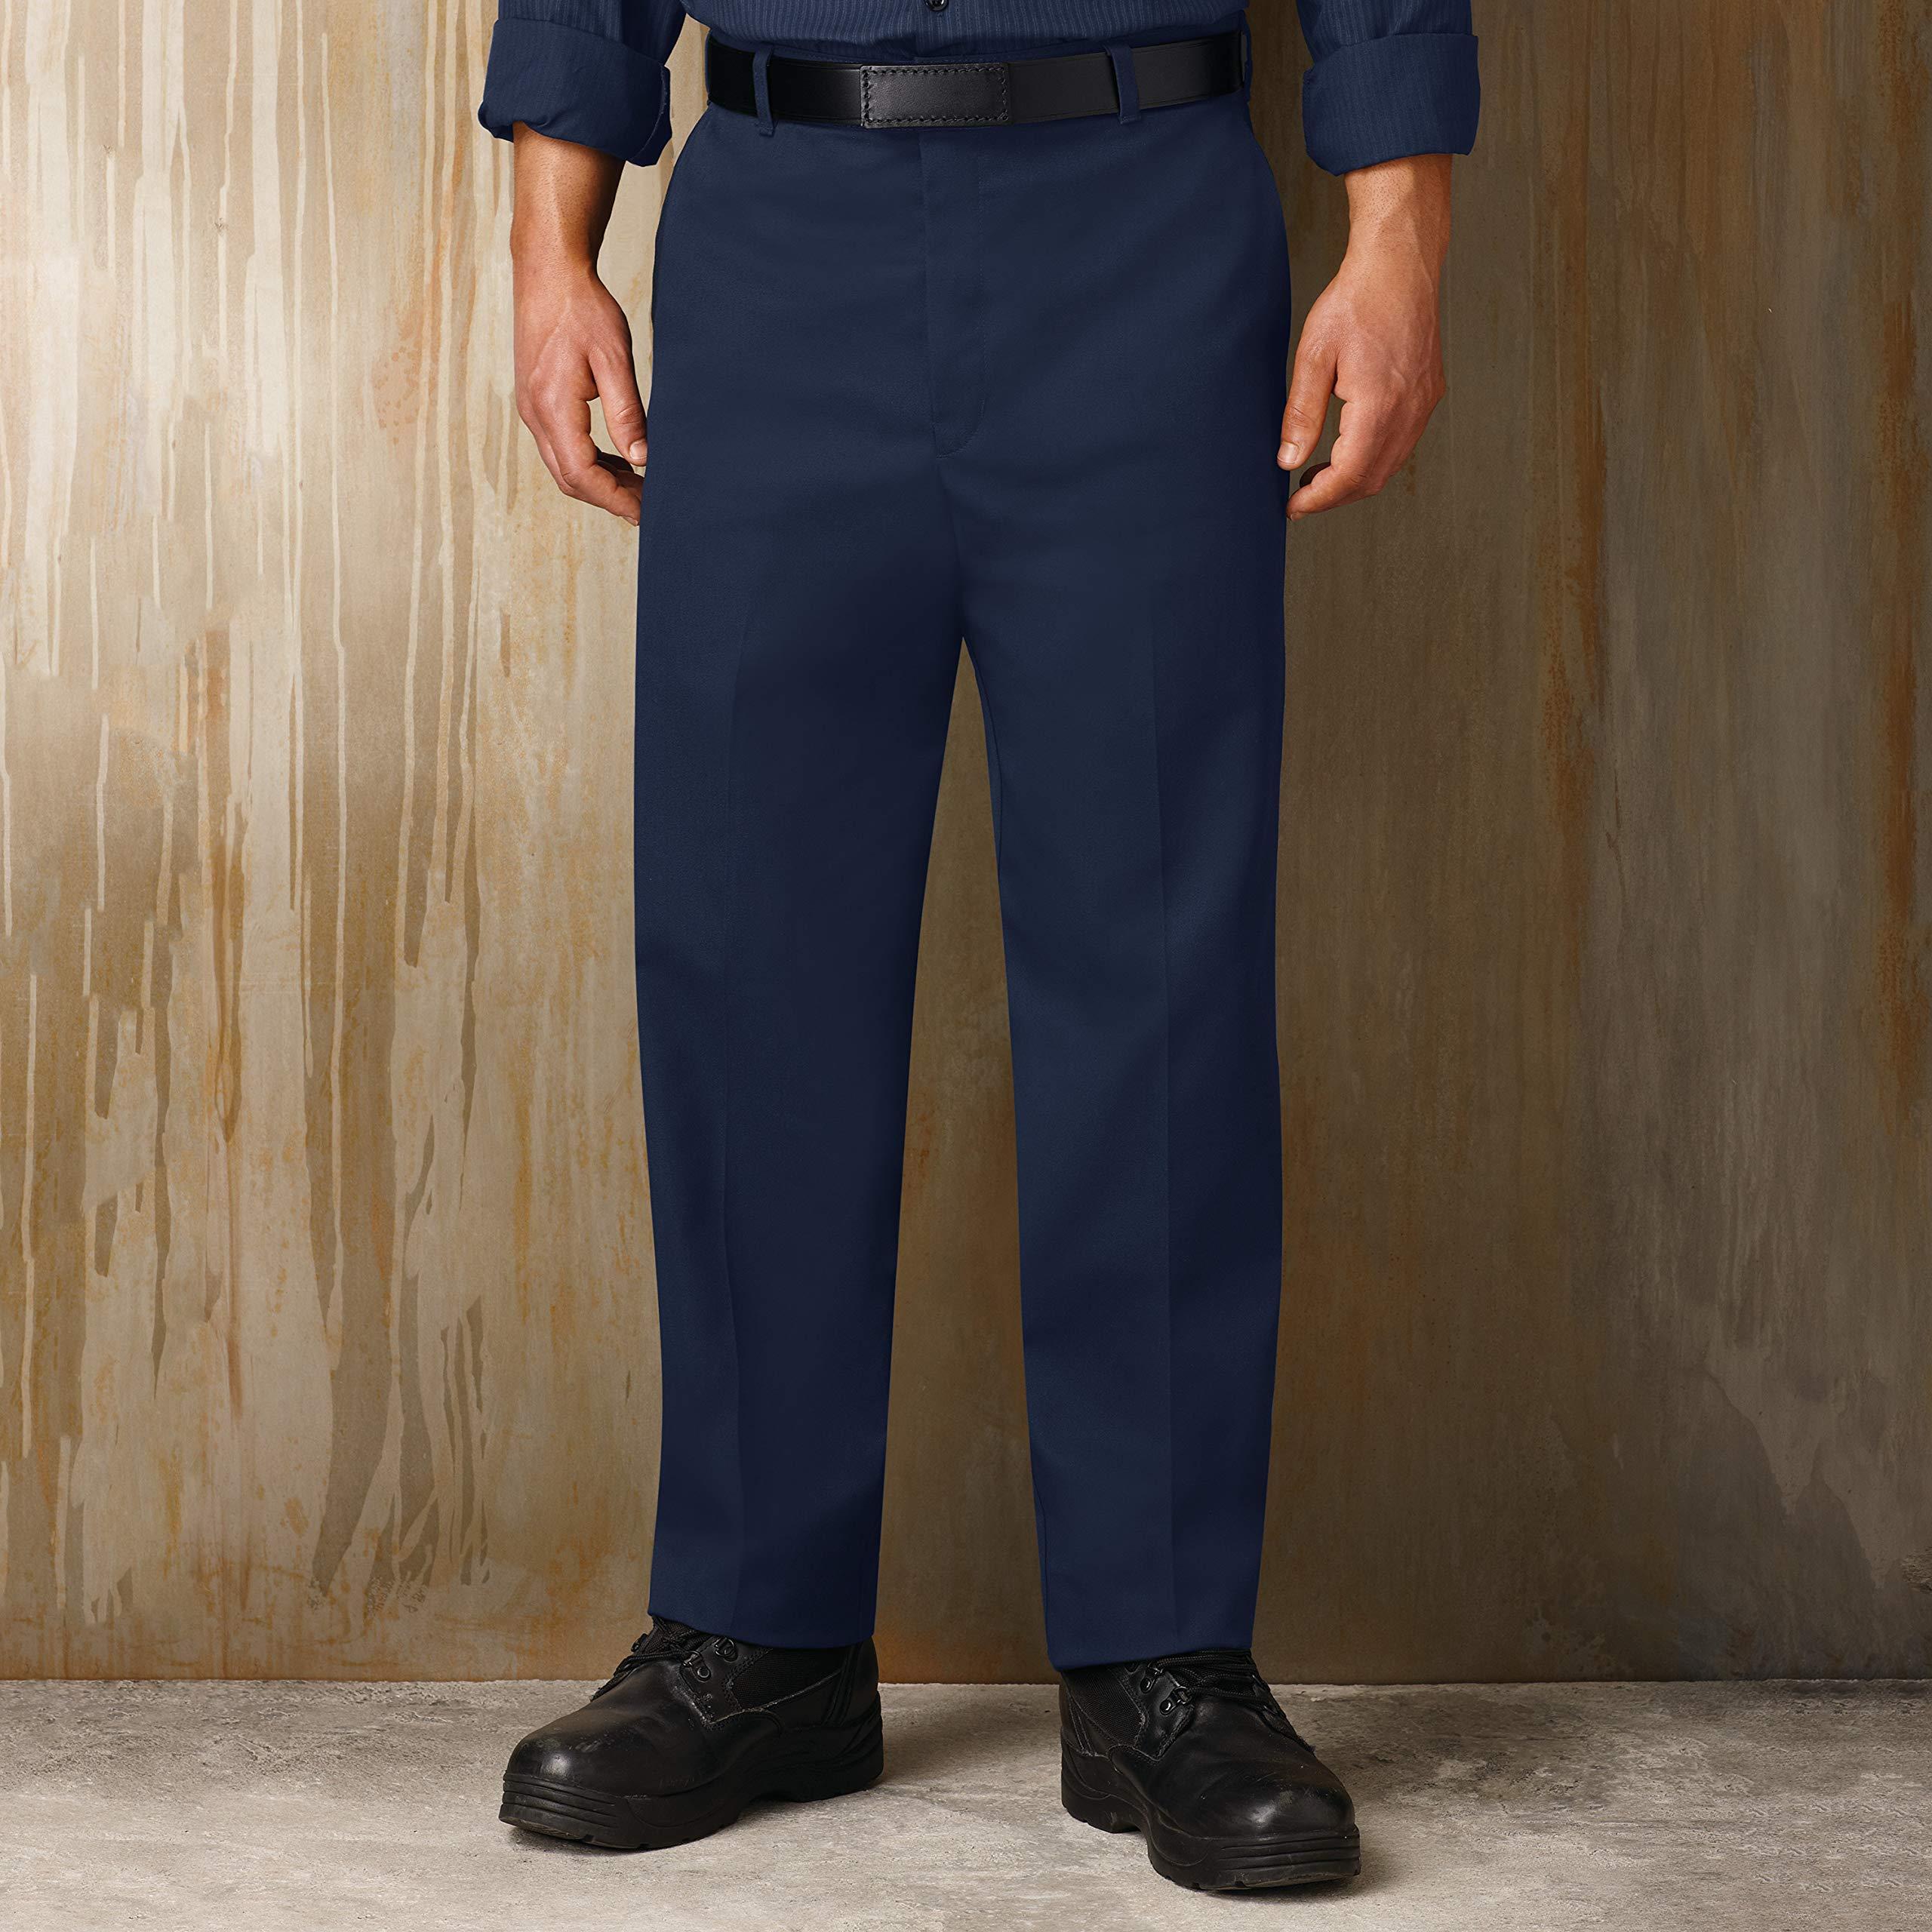 Red Kap Men's Stain Resistant Flat Front Work Pants